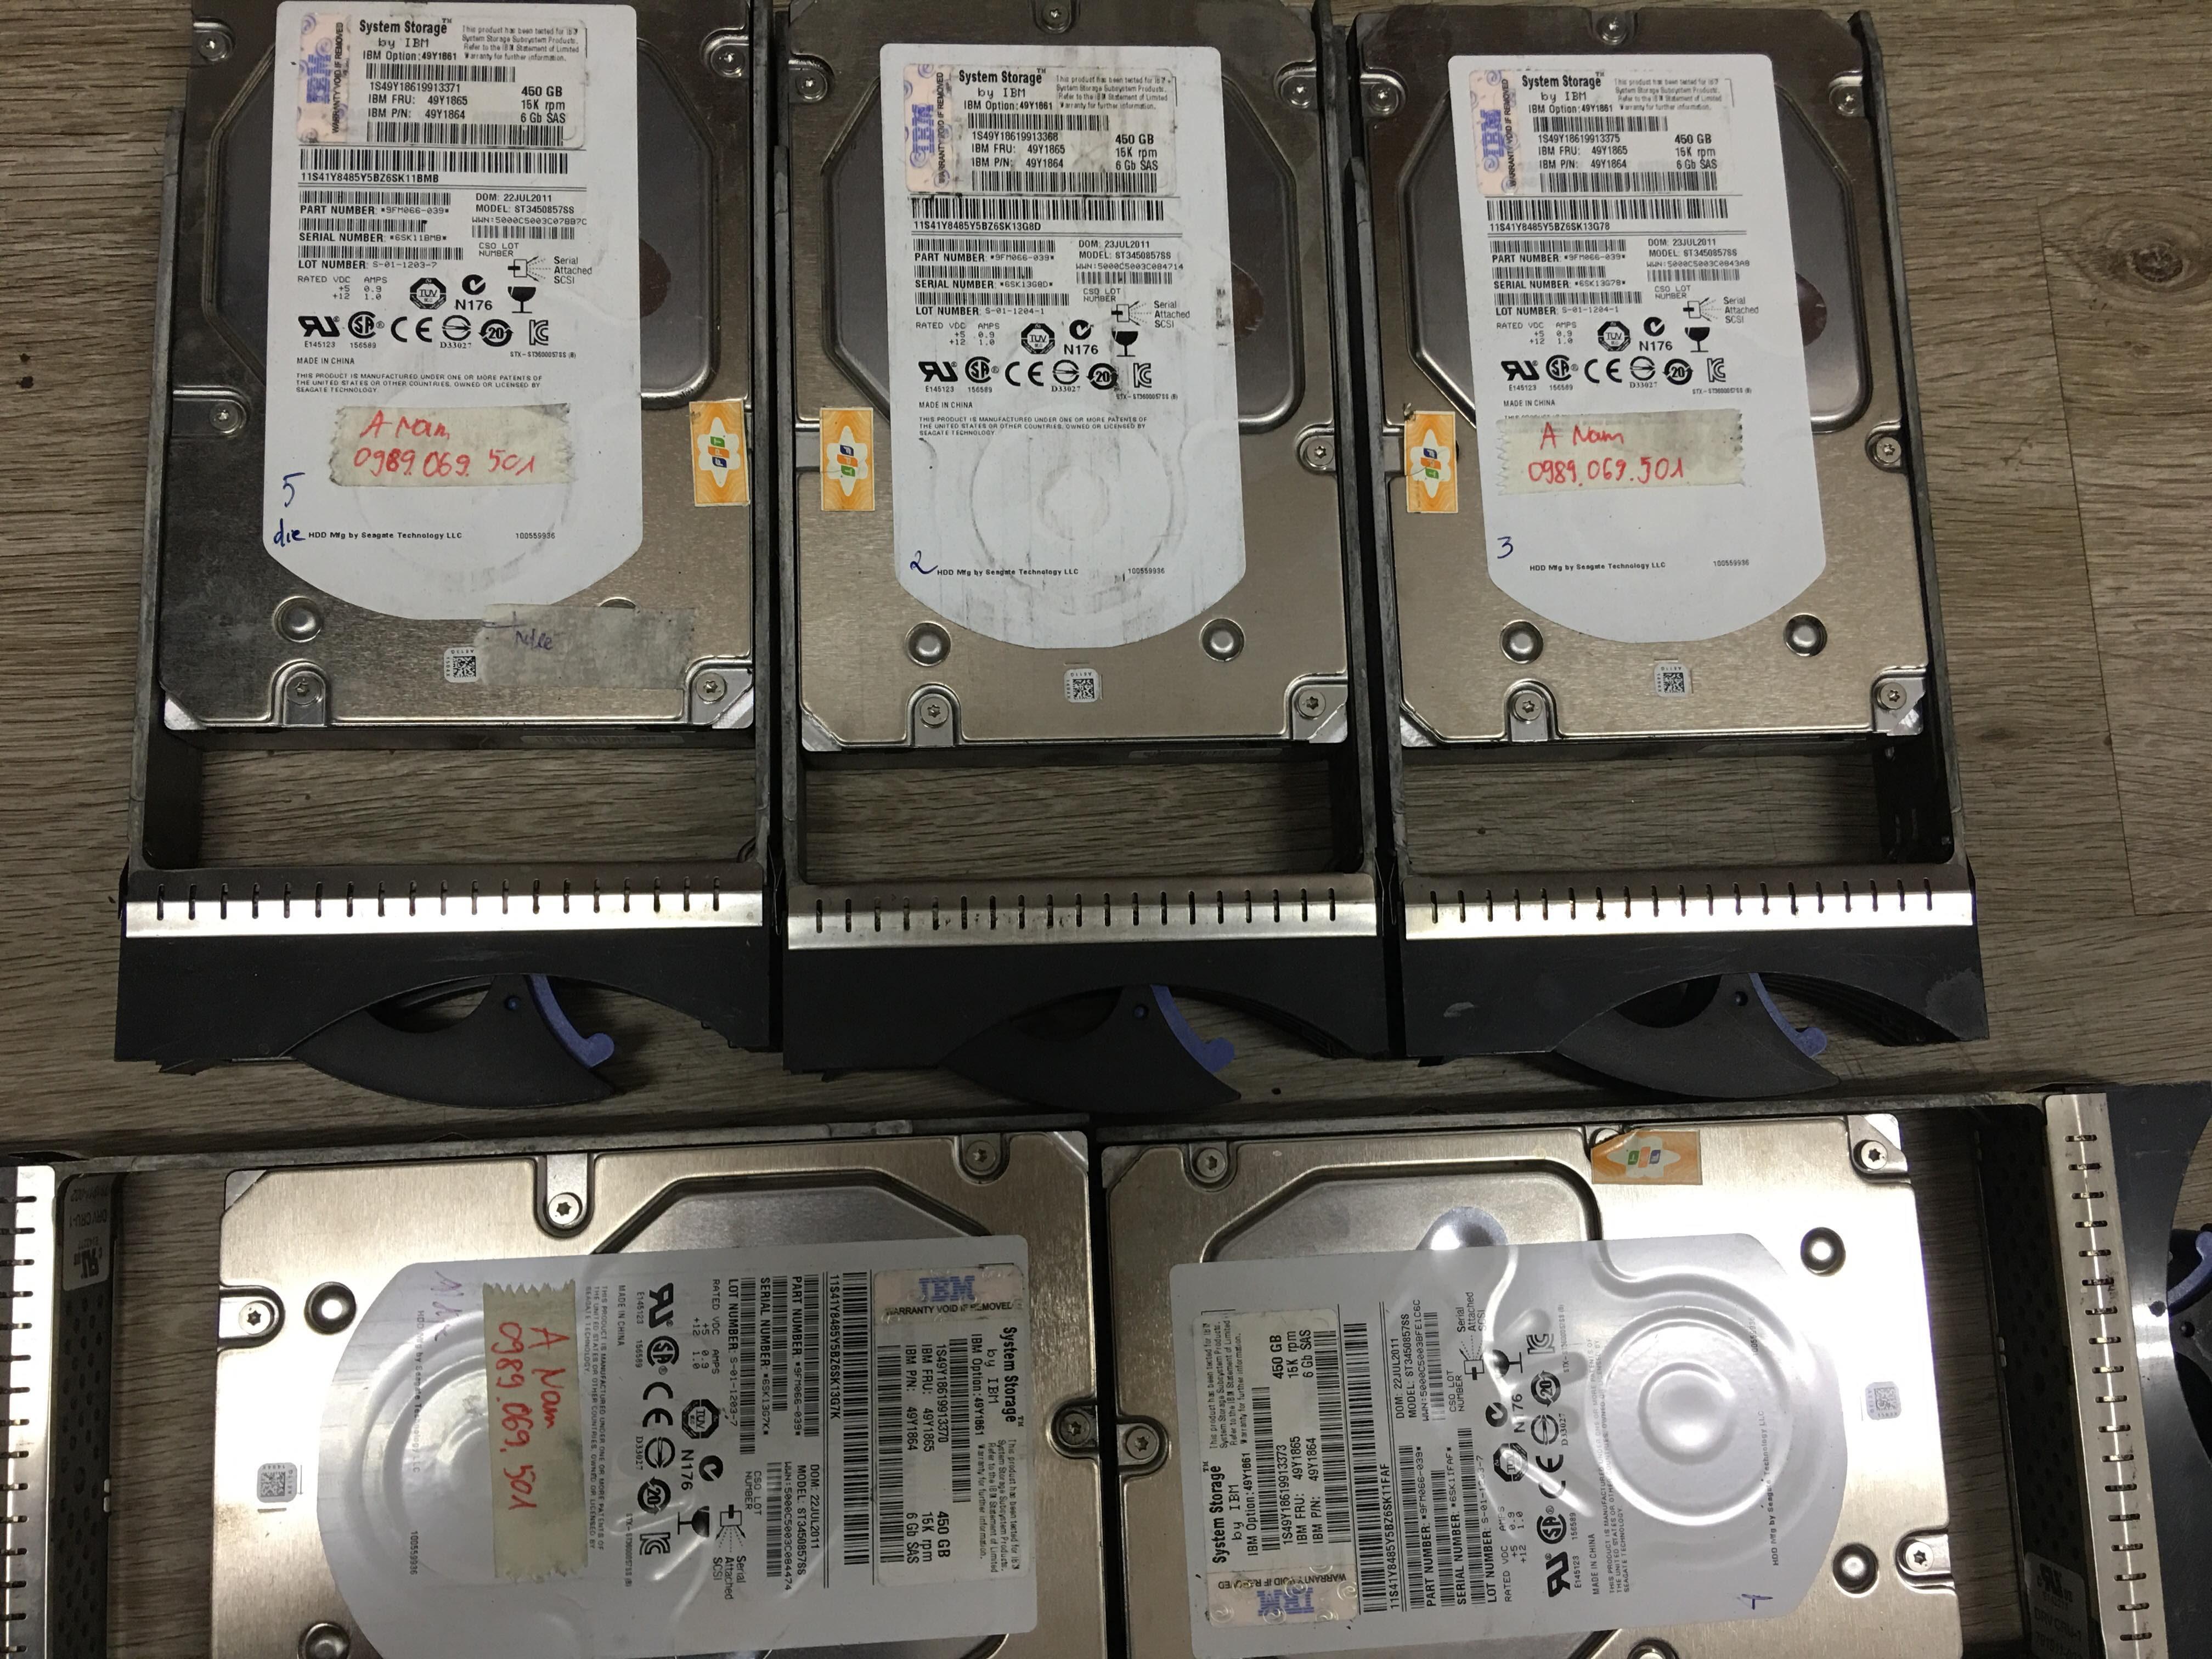 Cứu dữ liệu máy chủ IBM với 5HDDx450GB raid 5 lỗi 2HDD 05/08/2019 - cuumaytinh